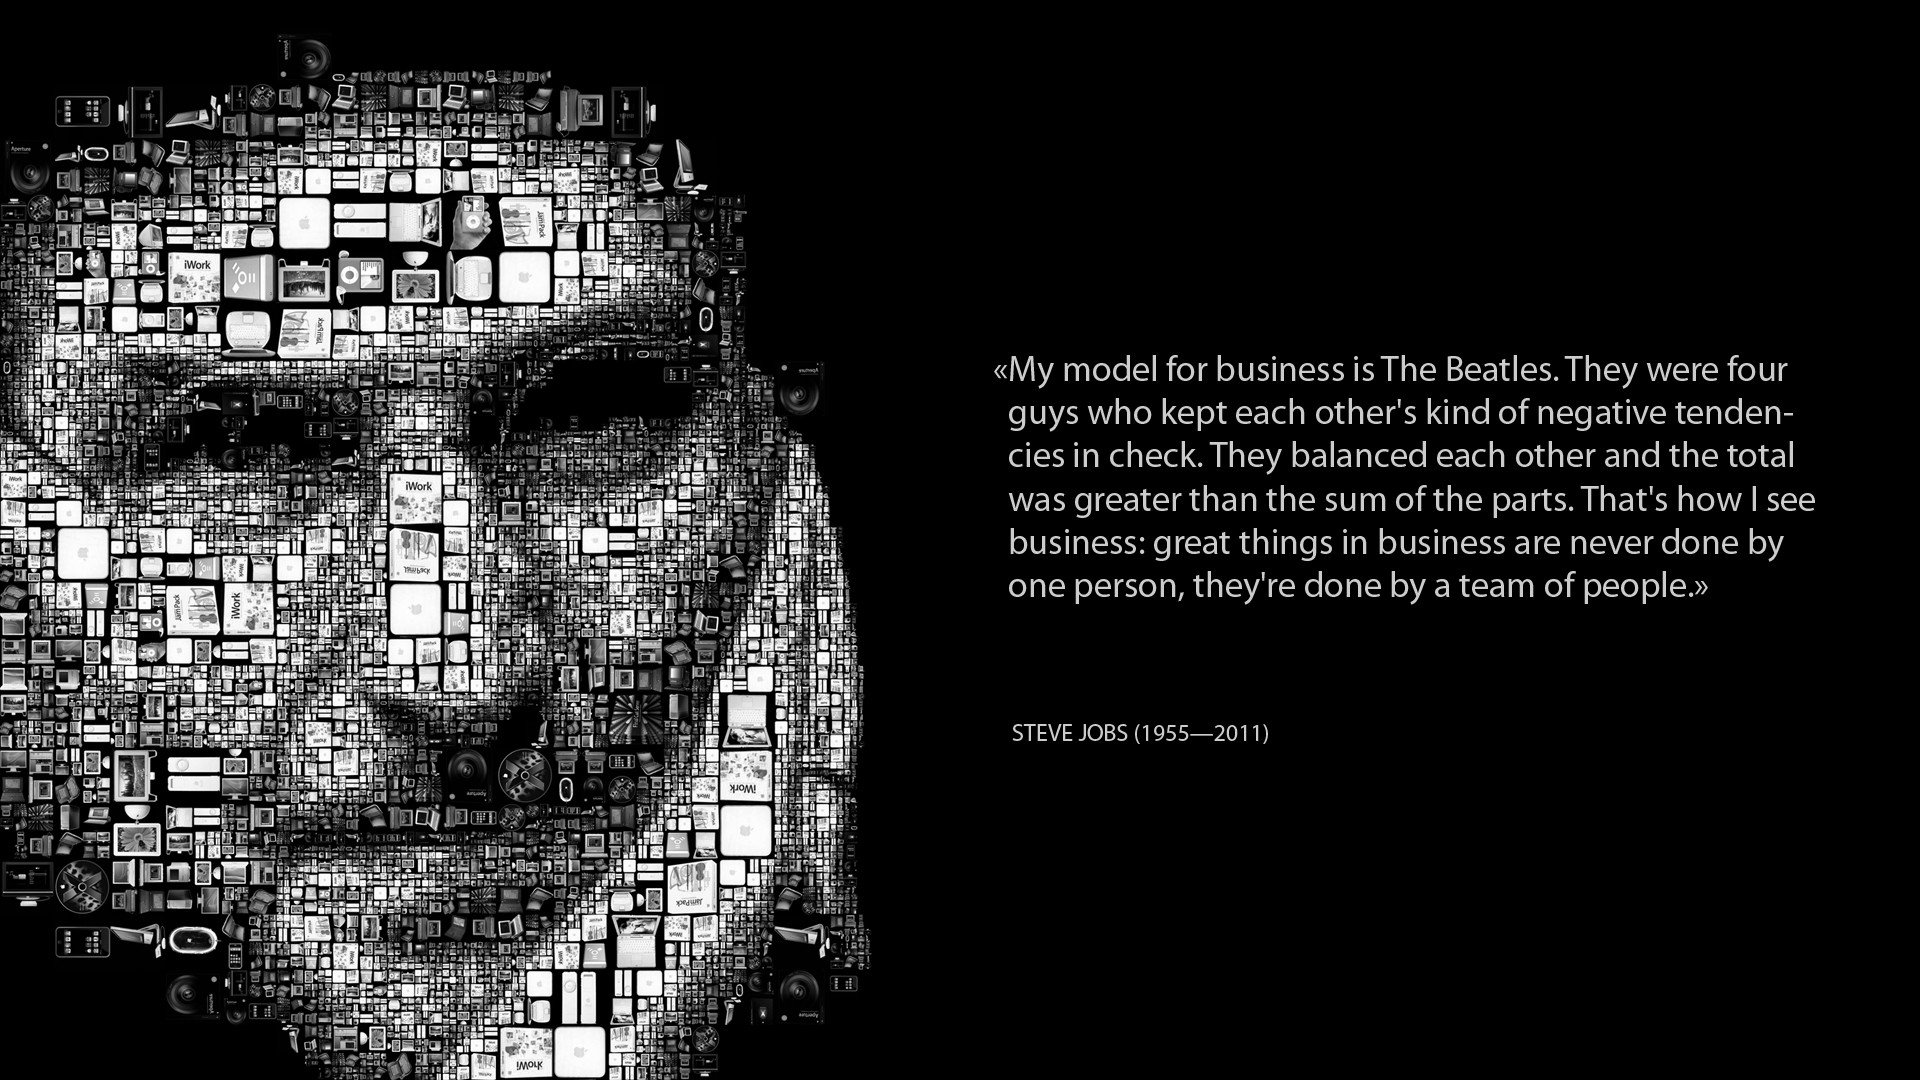 steve jobs inspirational quote wallpaper